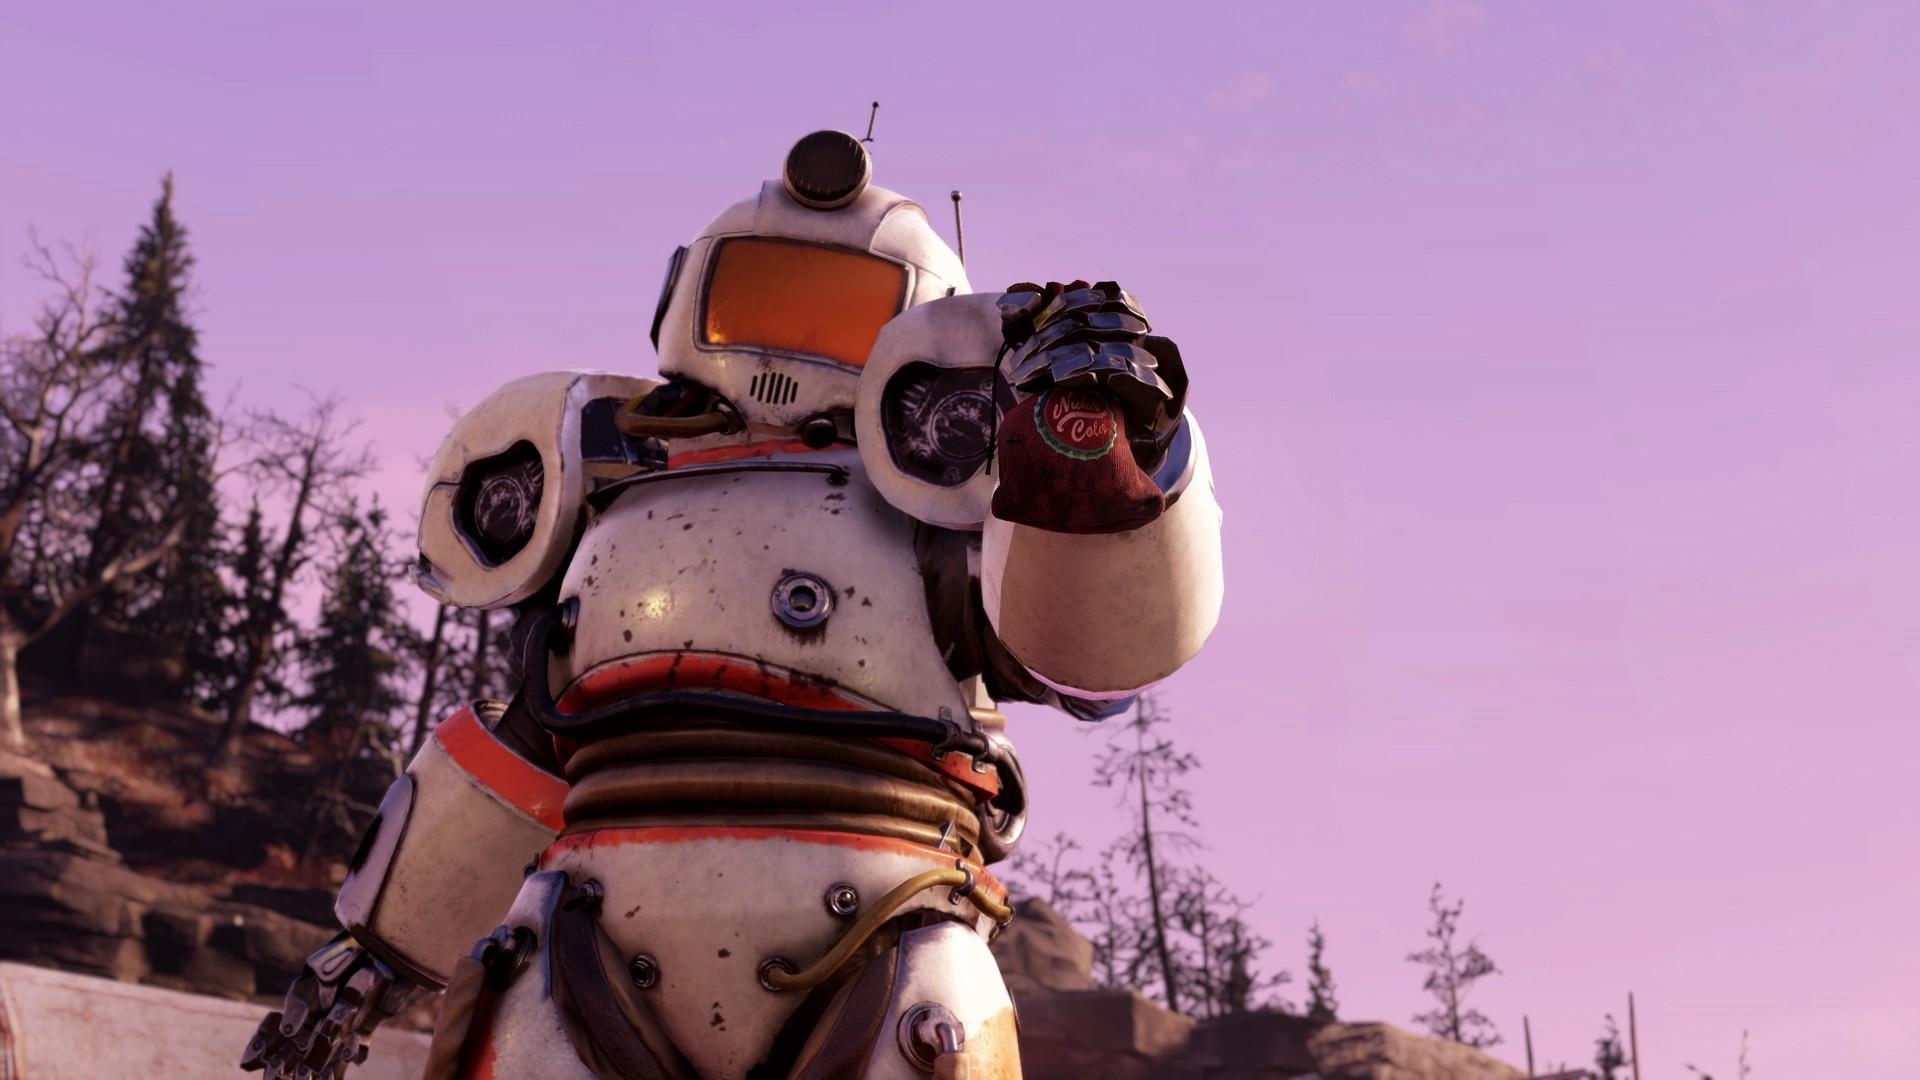 Bethesda Fallout 76 Season 1